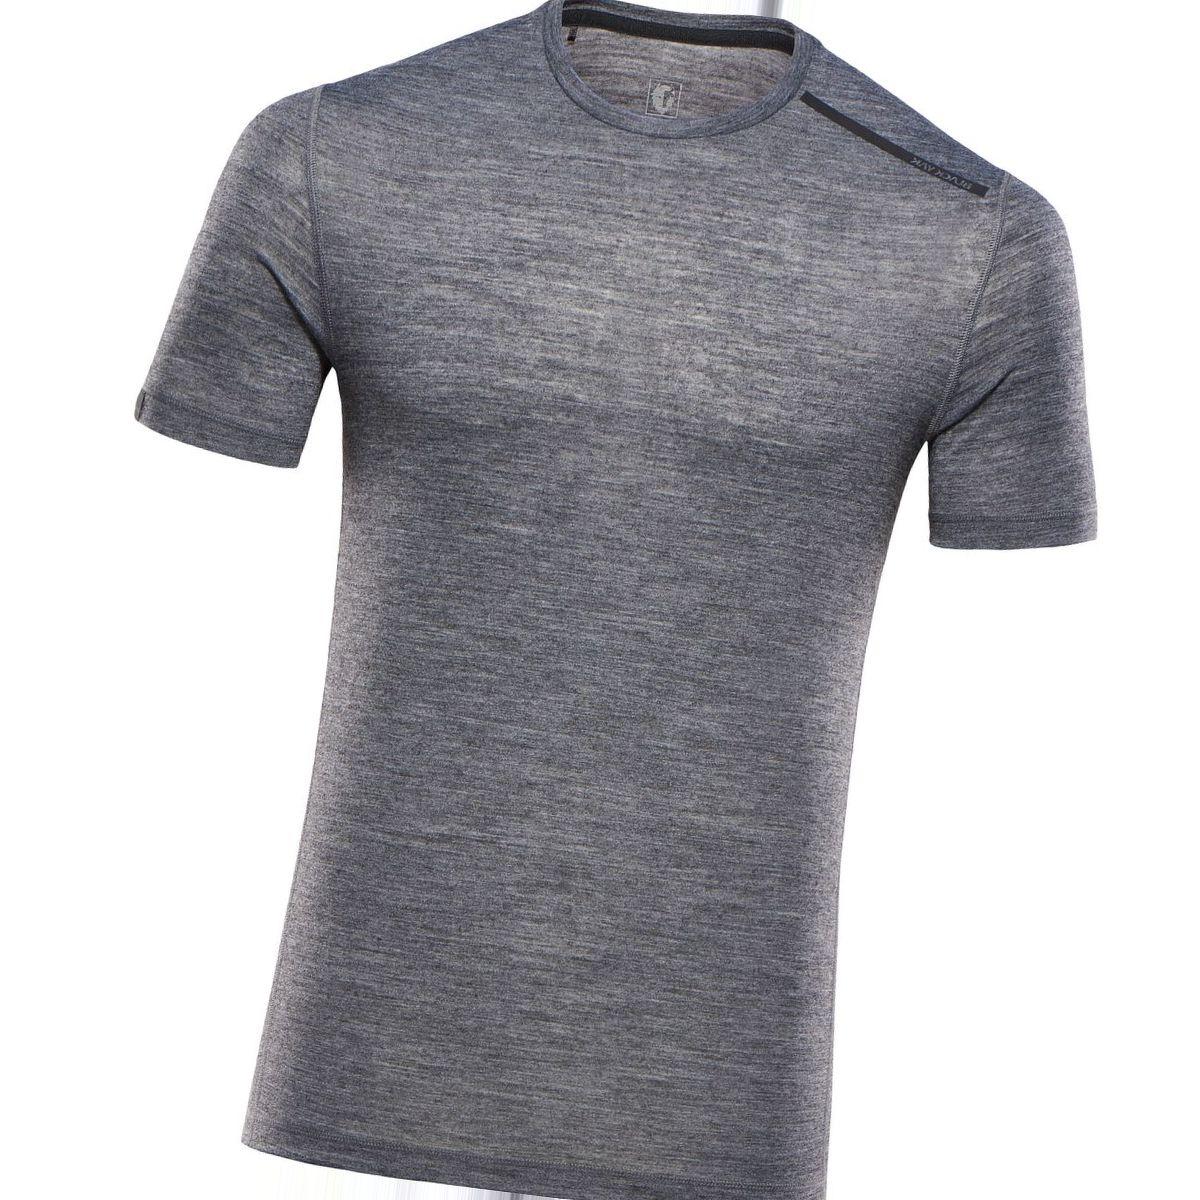 BLACKYAK Fulani Shirt - Men's